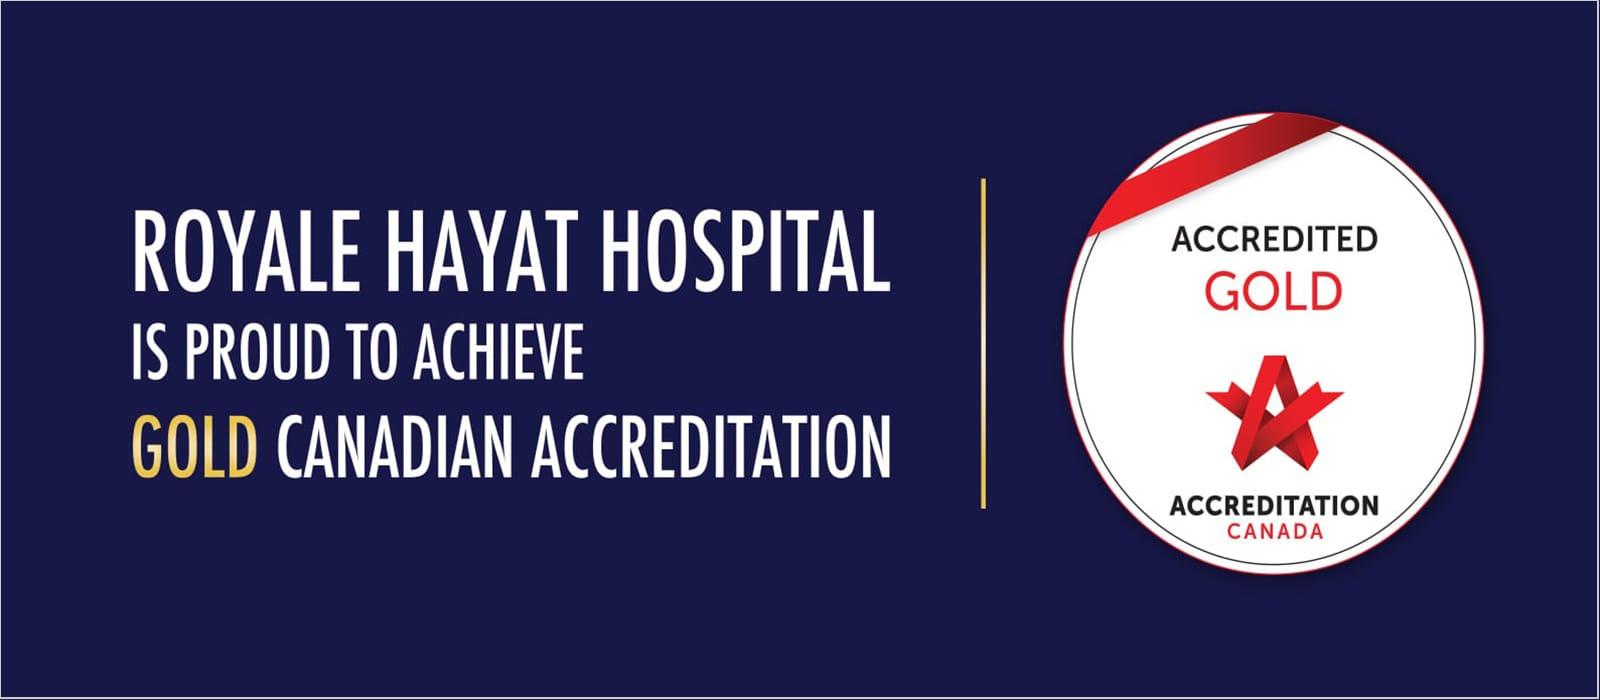 Royale Hayat Hospital - a Mutli-Specialty Best Luxury